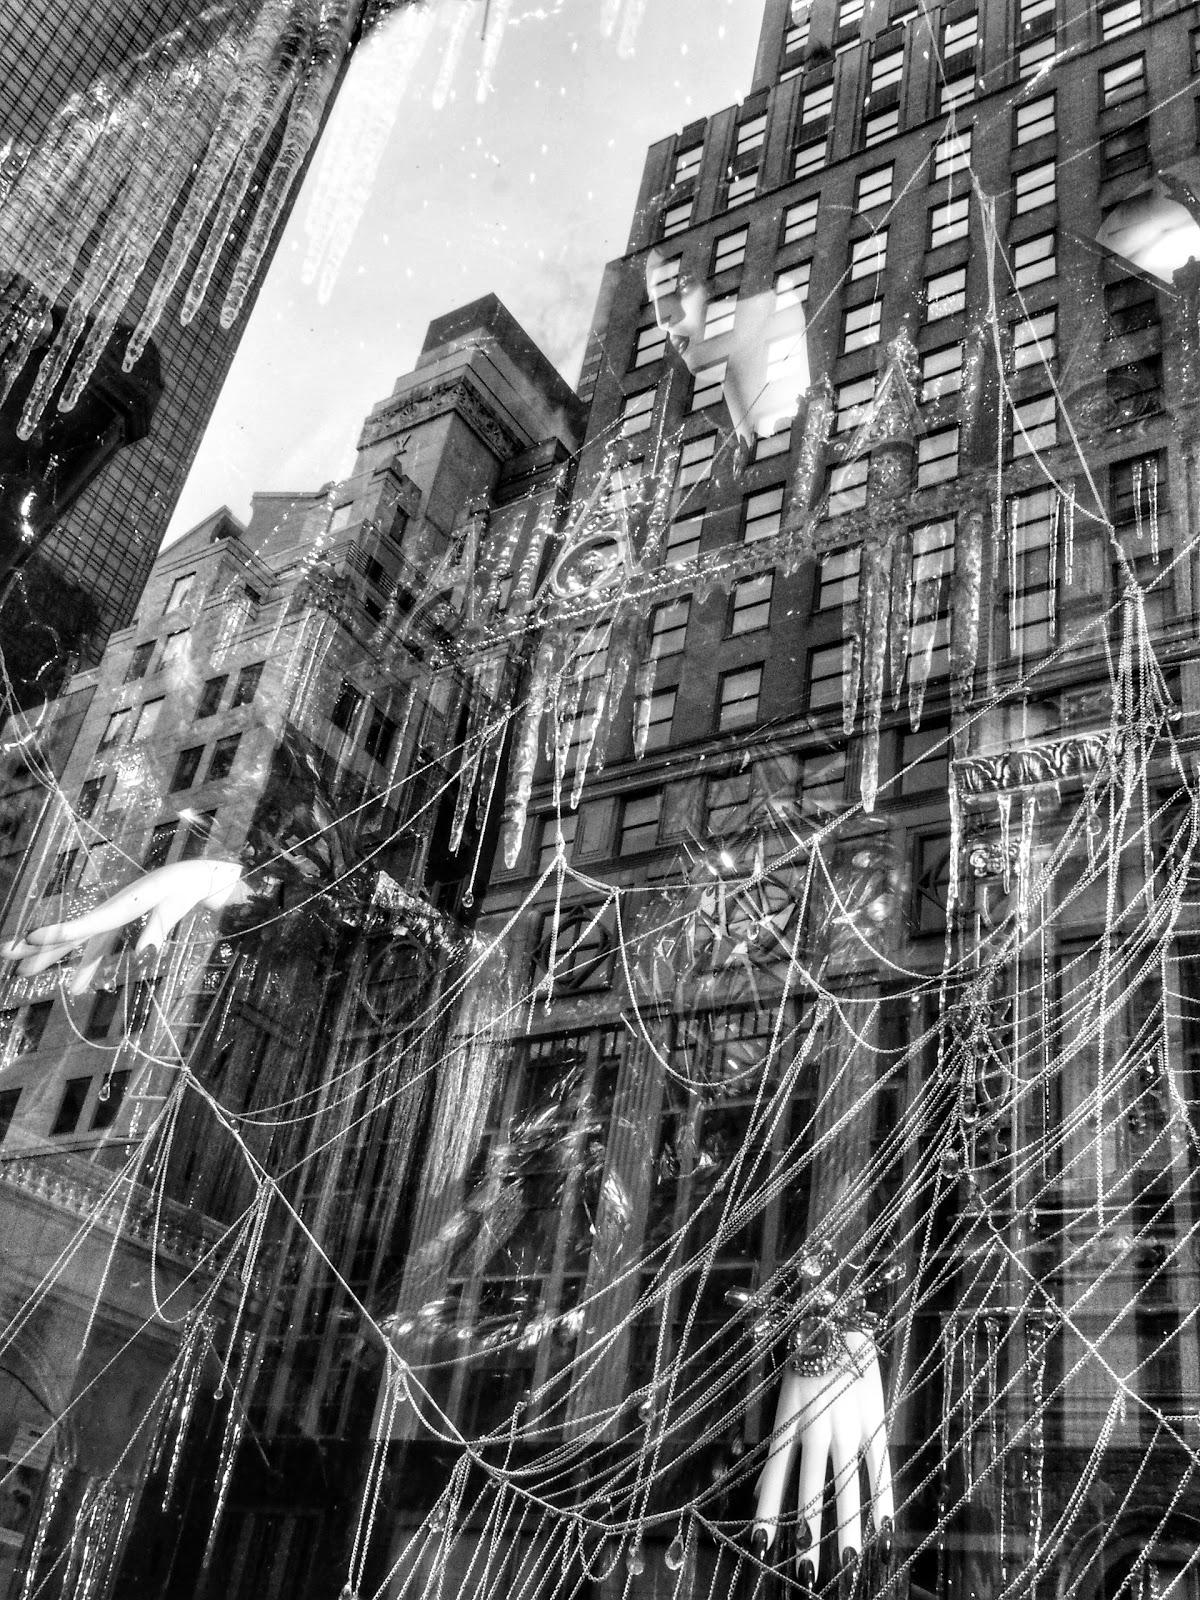 Floating, #floating #reflections #Halloween #holidaysonice #bgwindows #nyc #bergdorf #nyc 2014